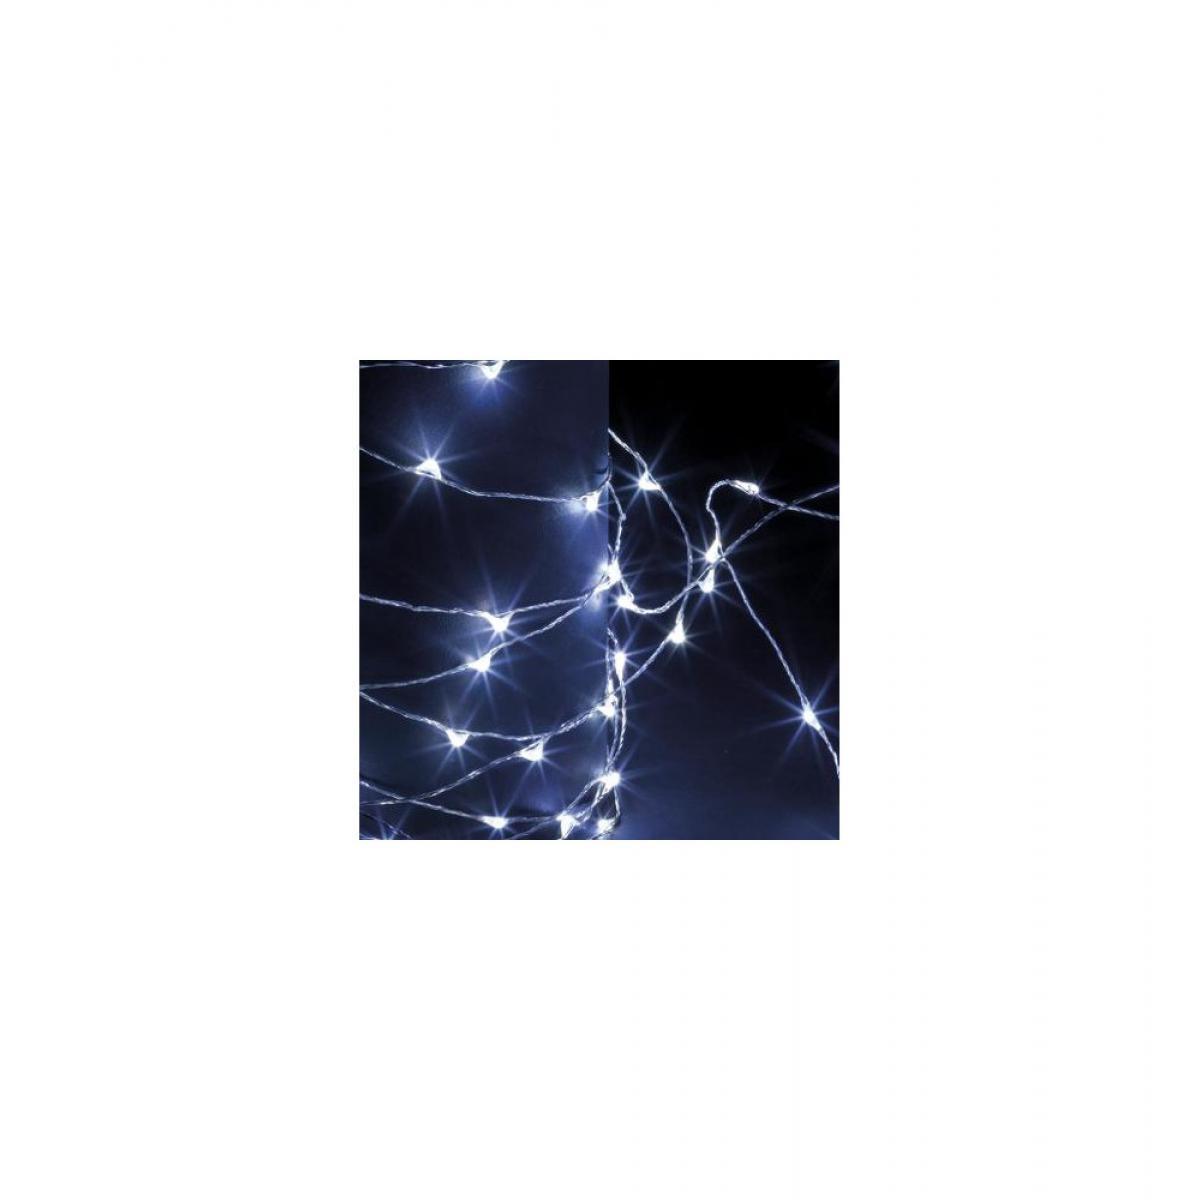 Ac-Deco Guirlande lumineuse - 20 M - Blanc chaud